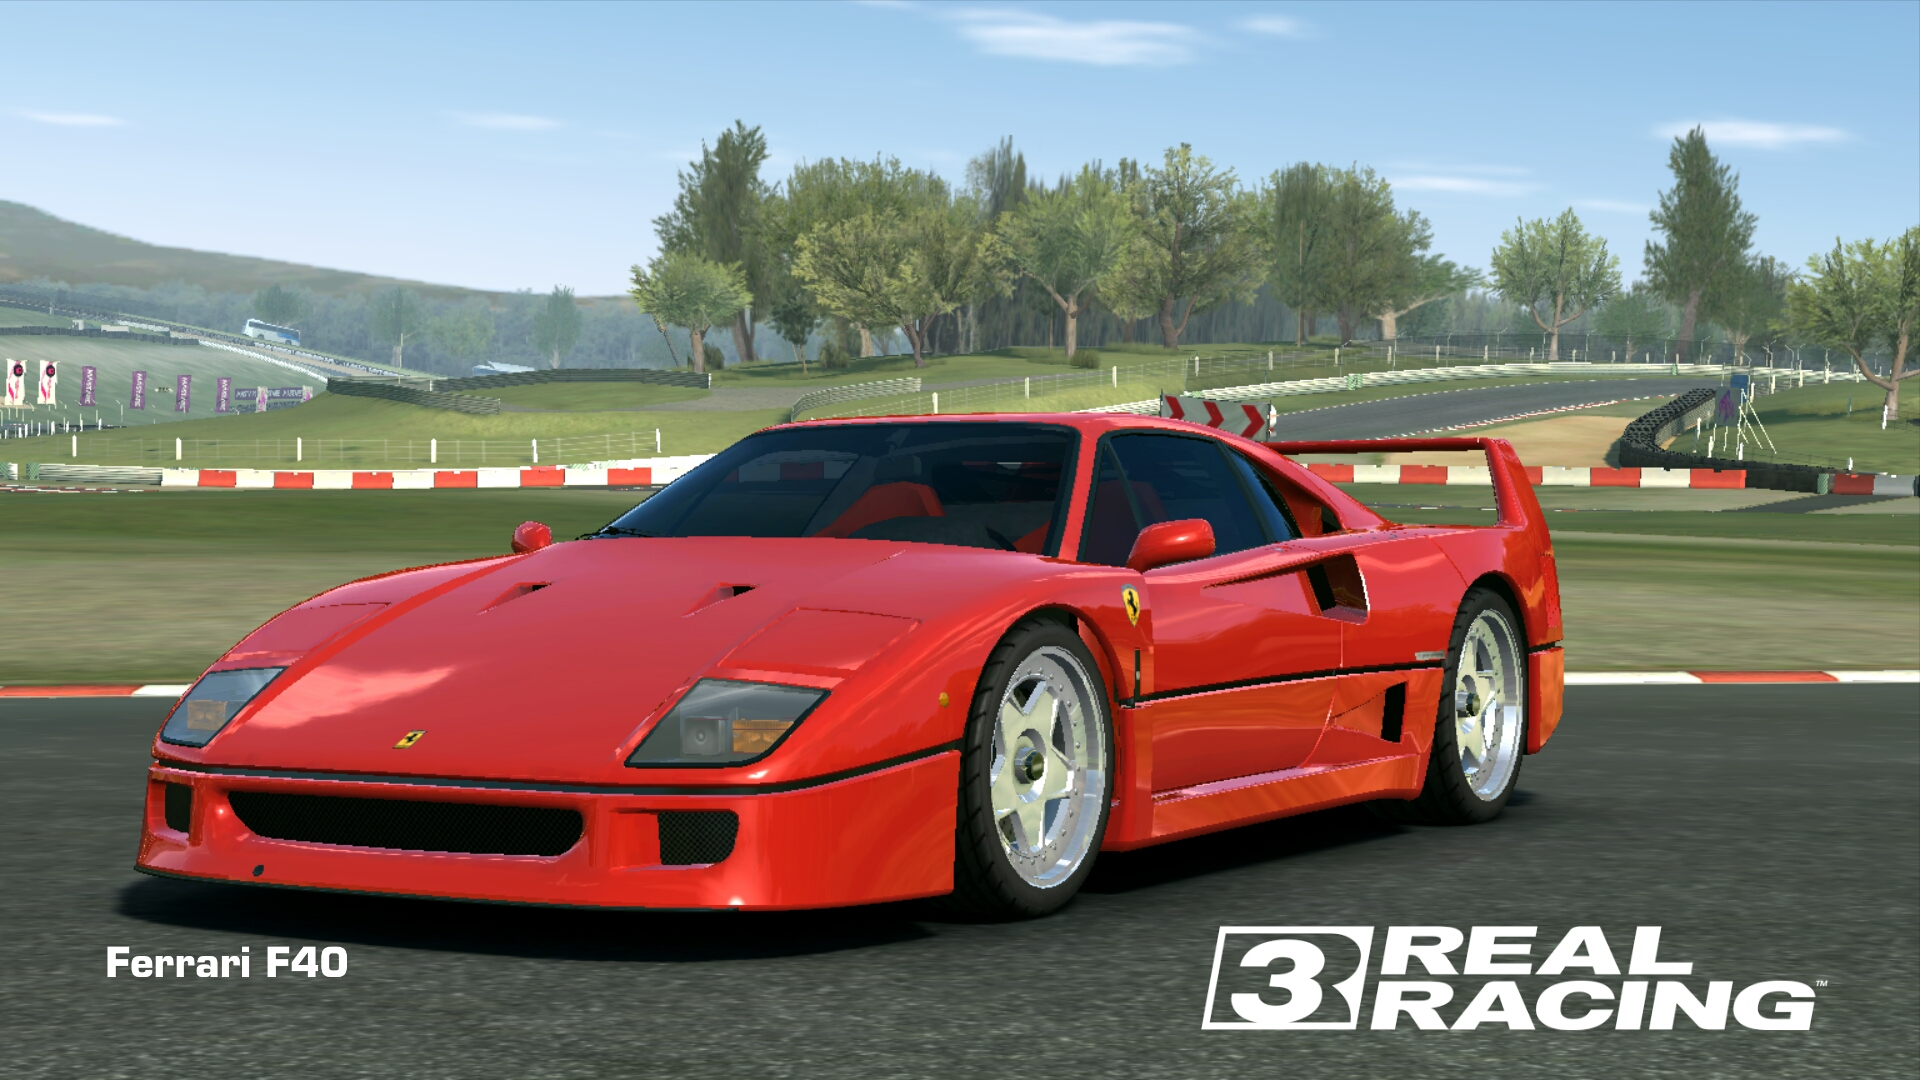 Ferrari f40 real racing 3 wiki fandom powered by wikia manufacturer ferrari 1987 vanachro Choice Image